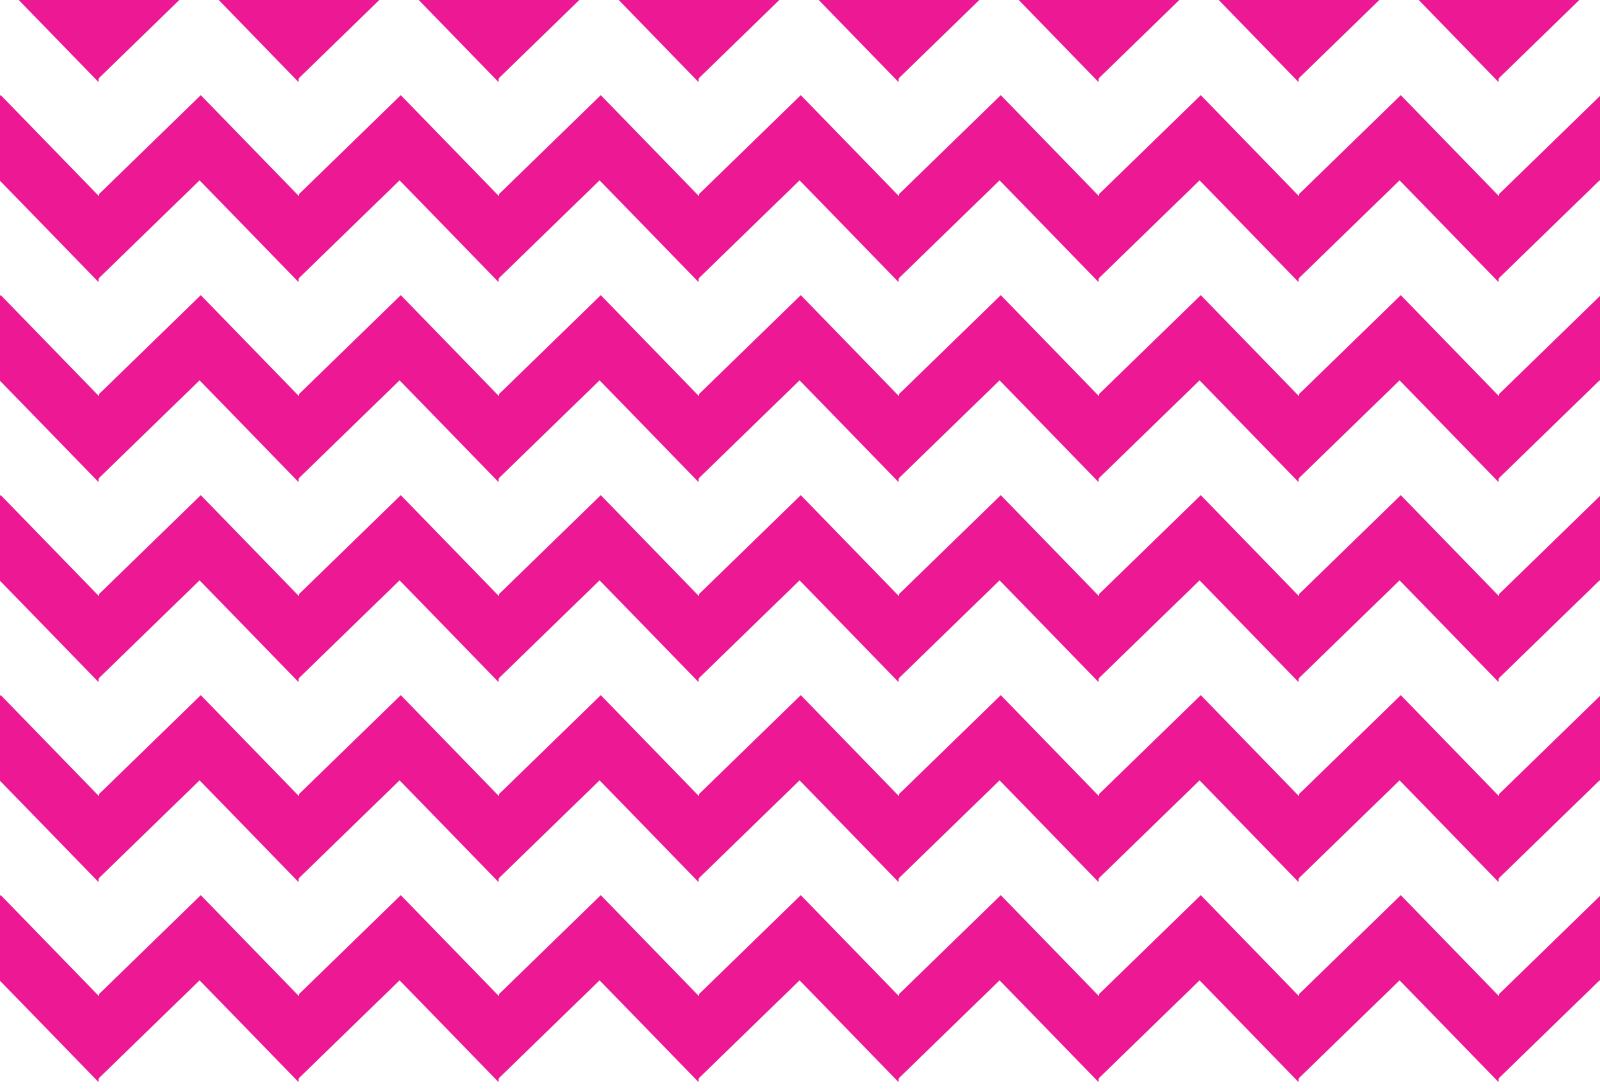 chevron pattern svg - HD1600×1092